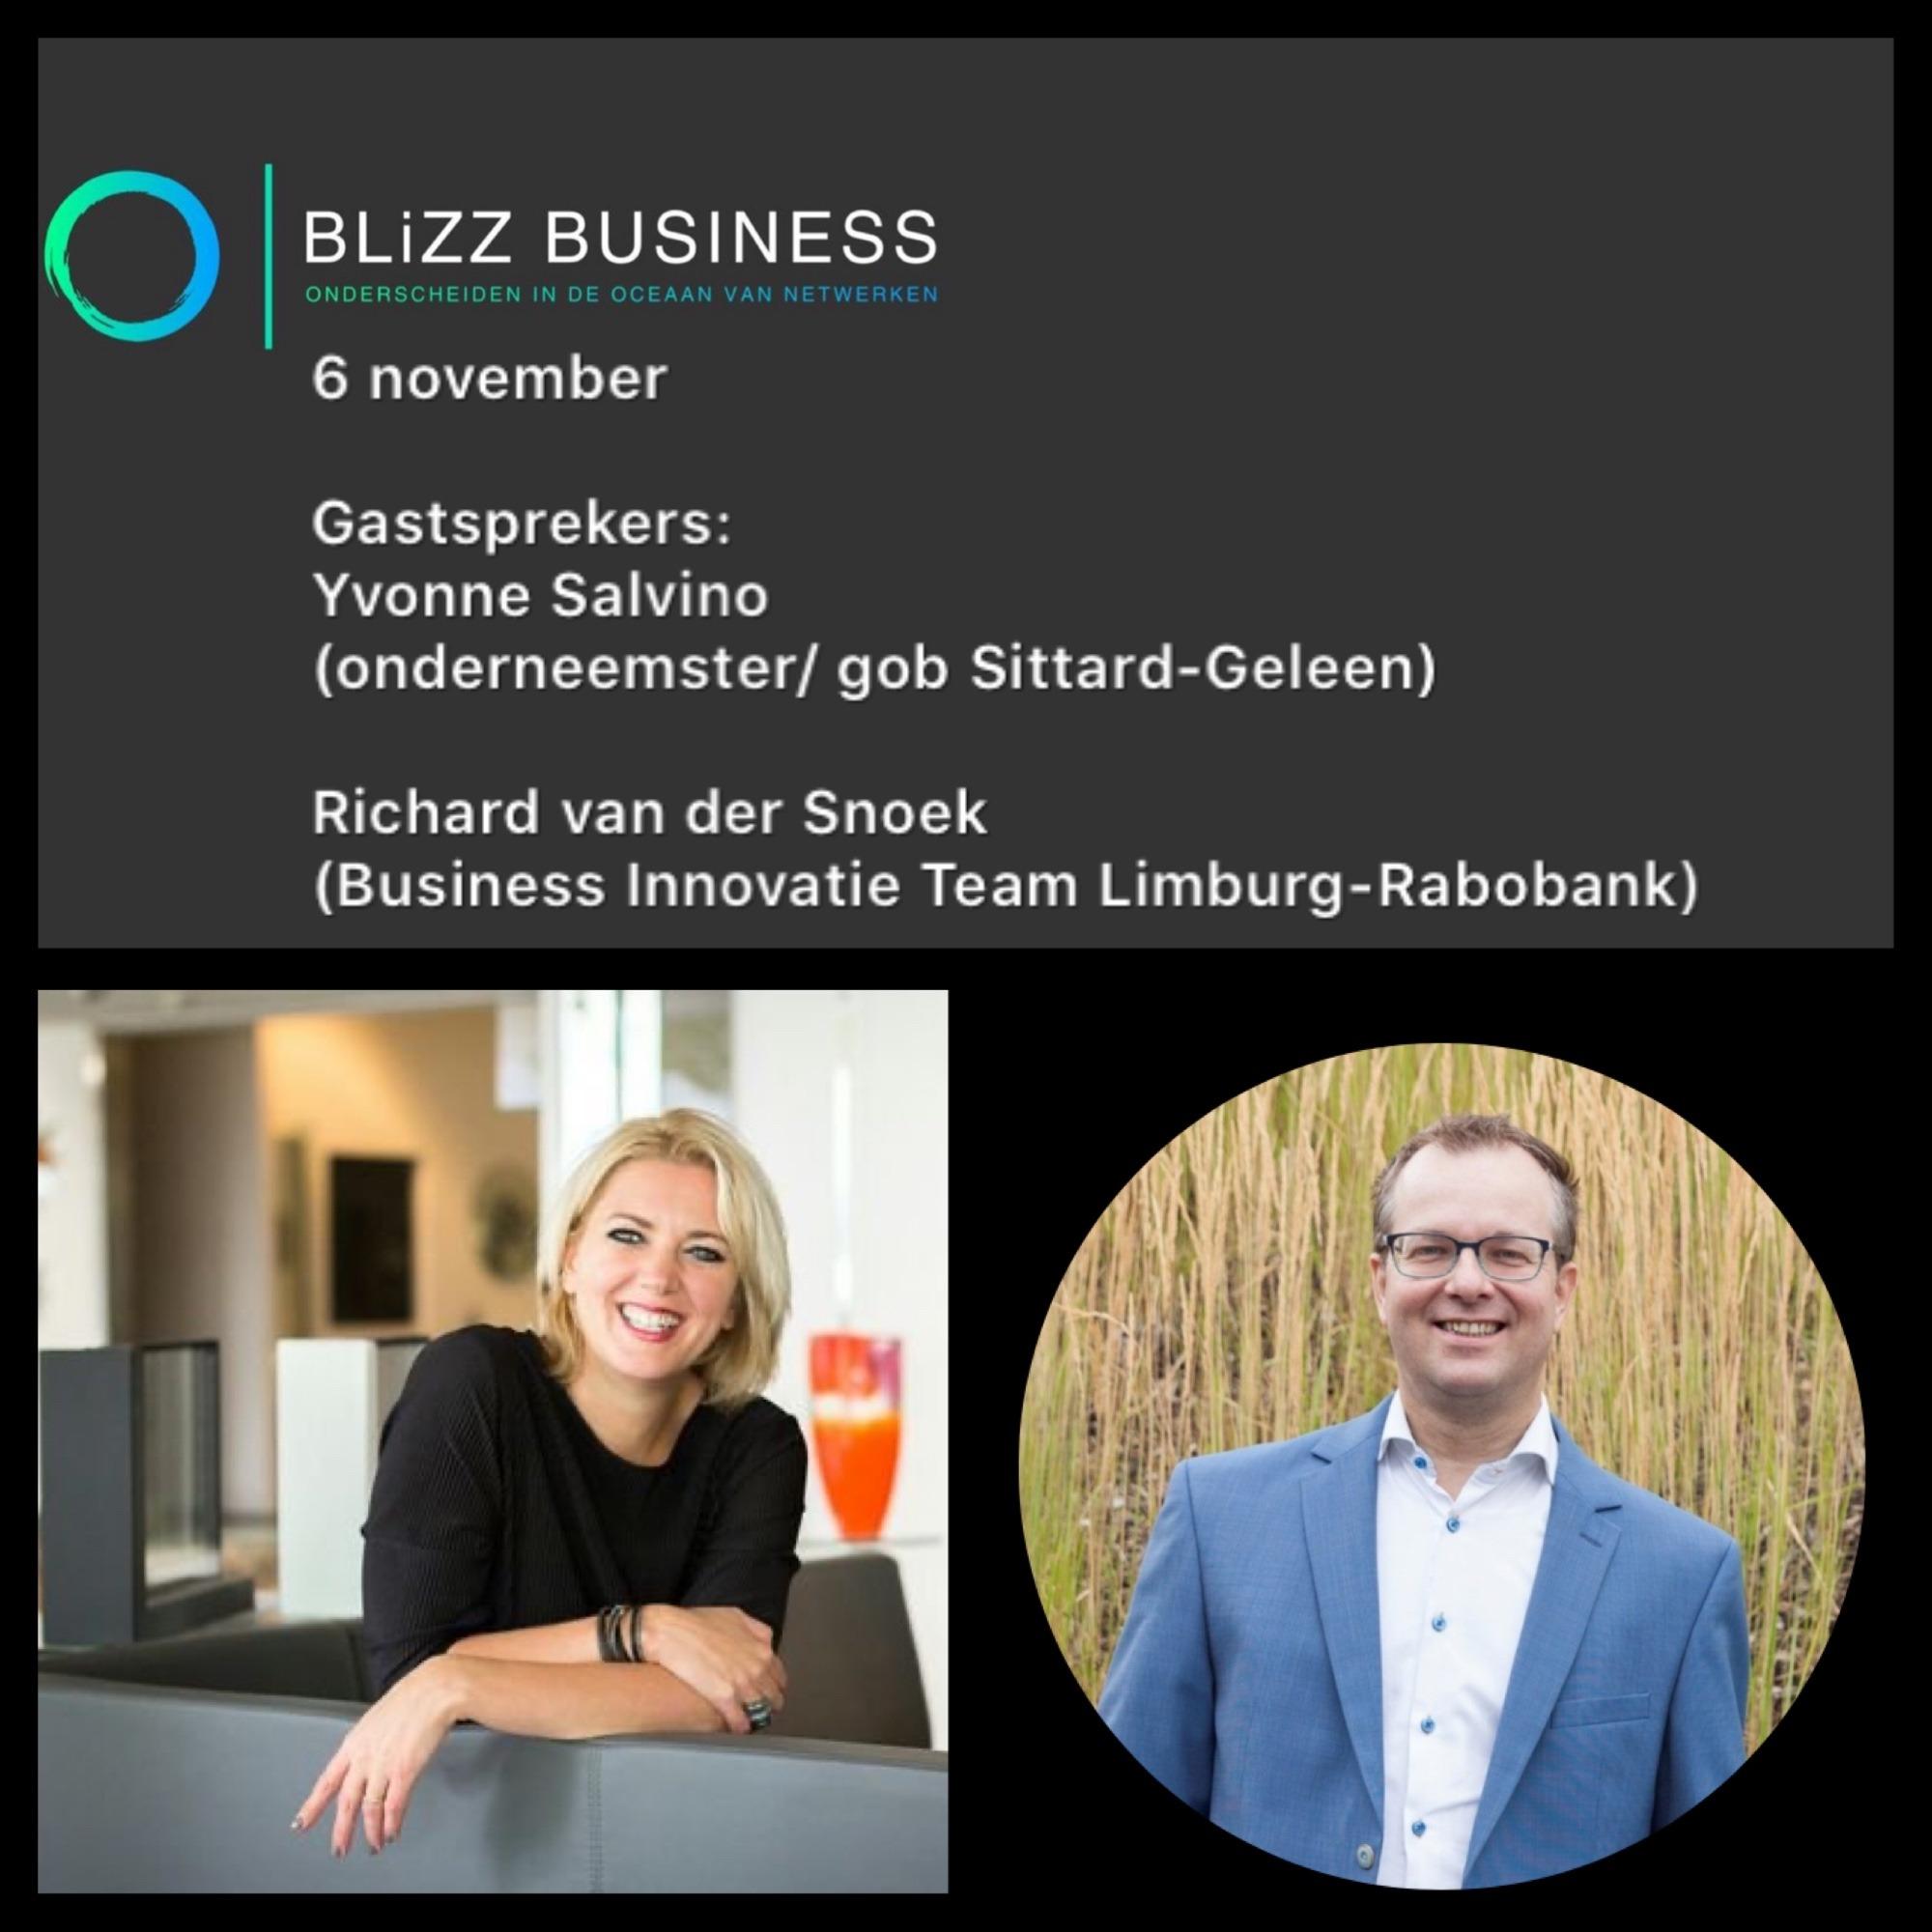 Yvonne Salvino glashandel onderneemster ondernemer politiek Sittard Geleen Richard van der Snoek Business innovatie team limburg rabobank gastsprekers ontbijt netwerken